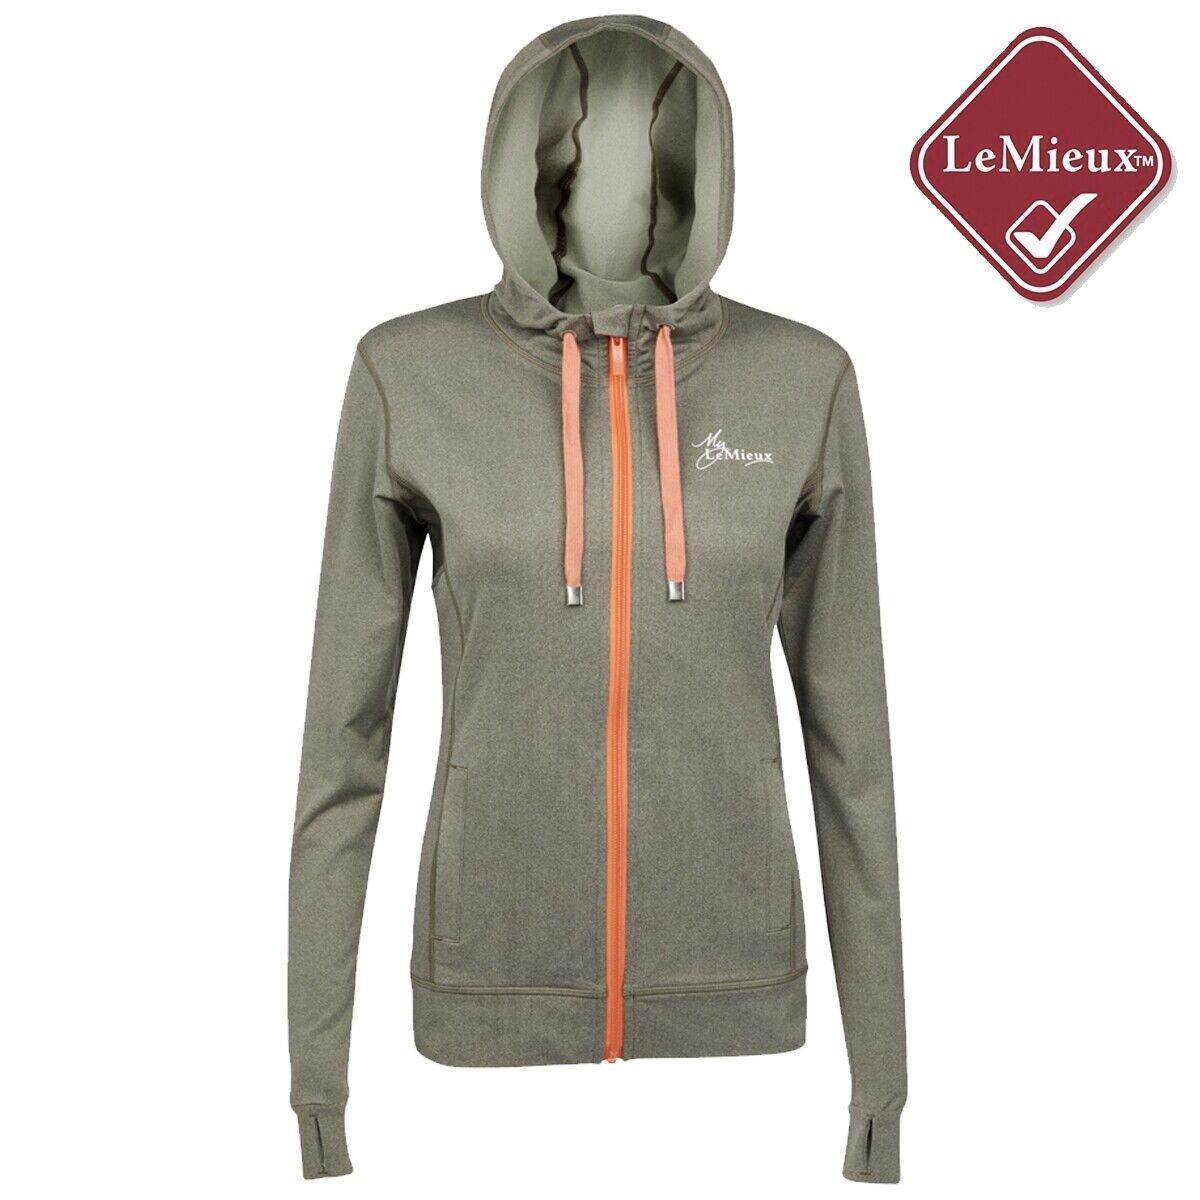 My LeMieux Activewear Hoodie - Khaki